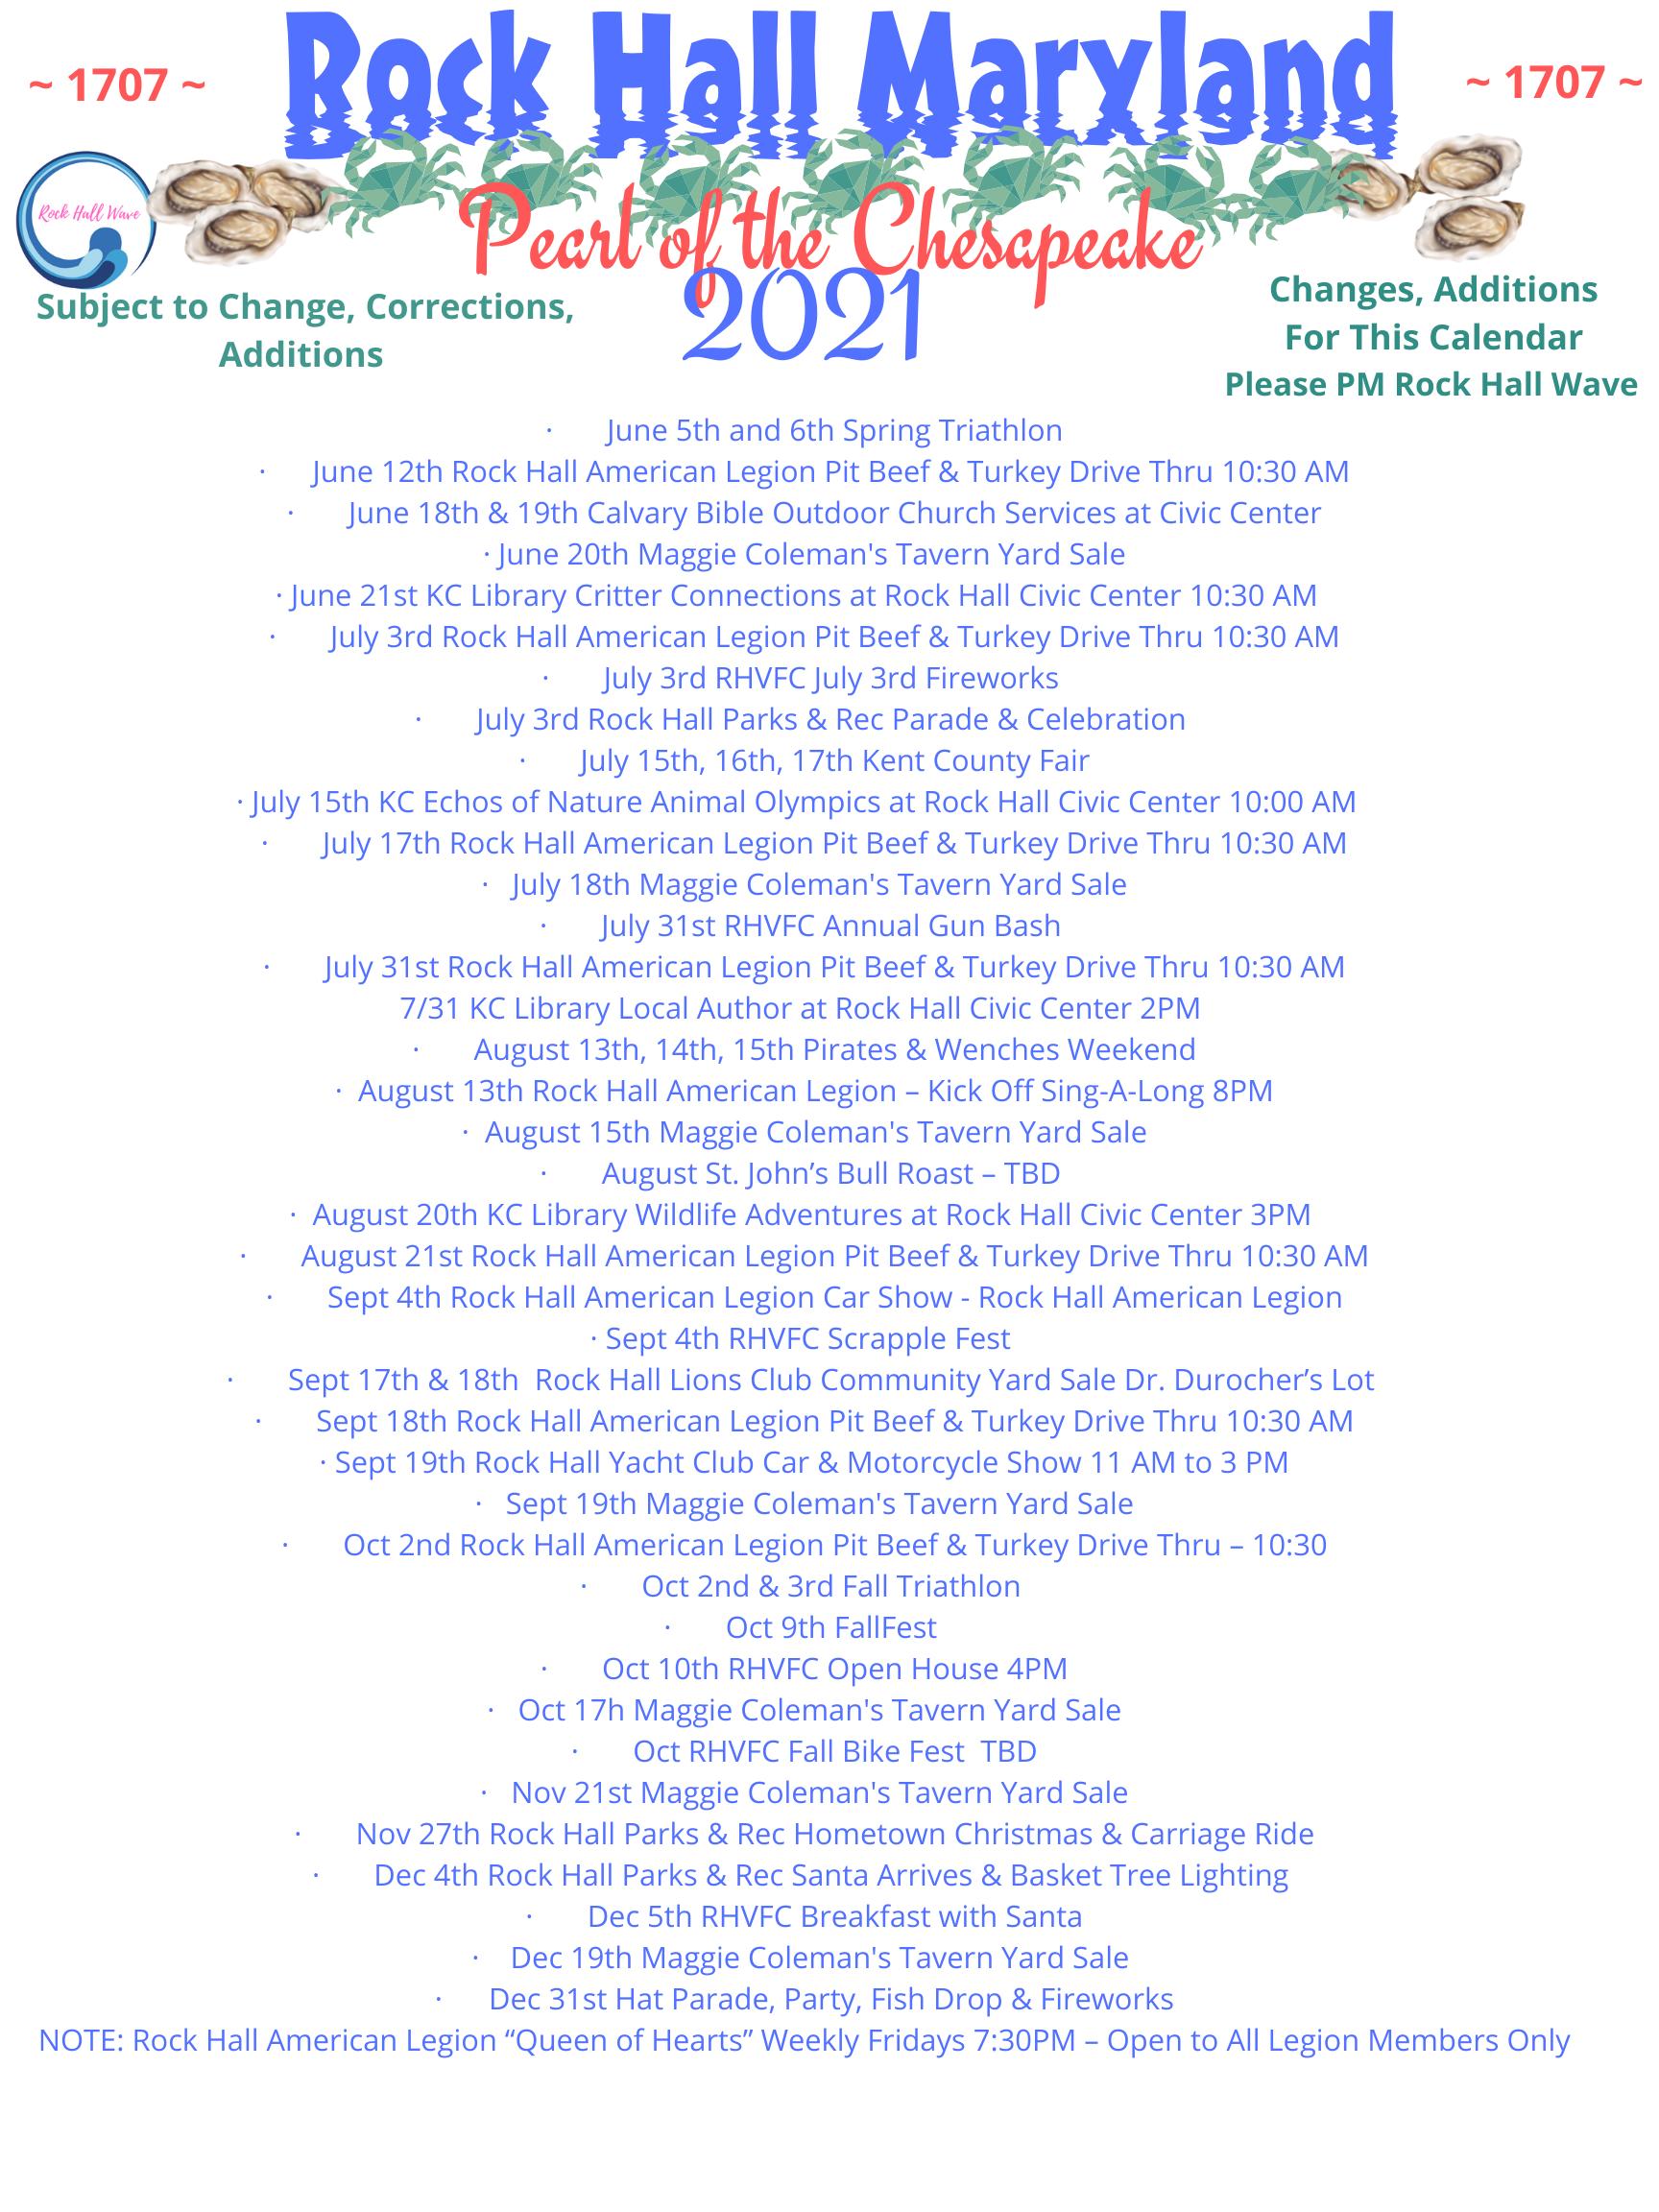 Calendar as of 6-1-21